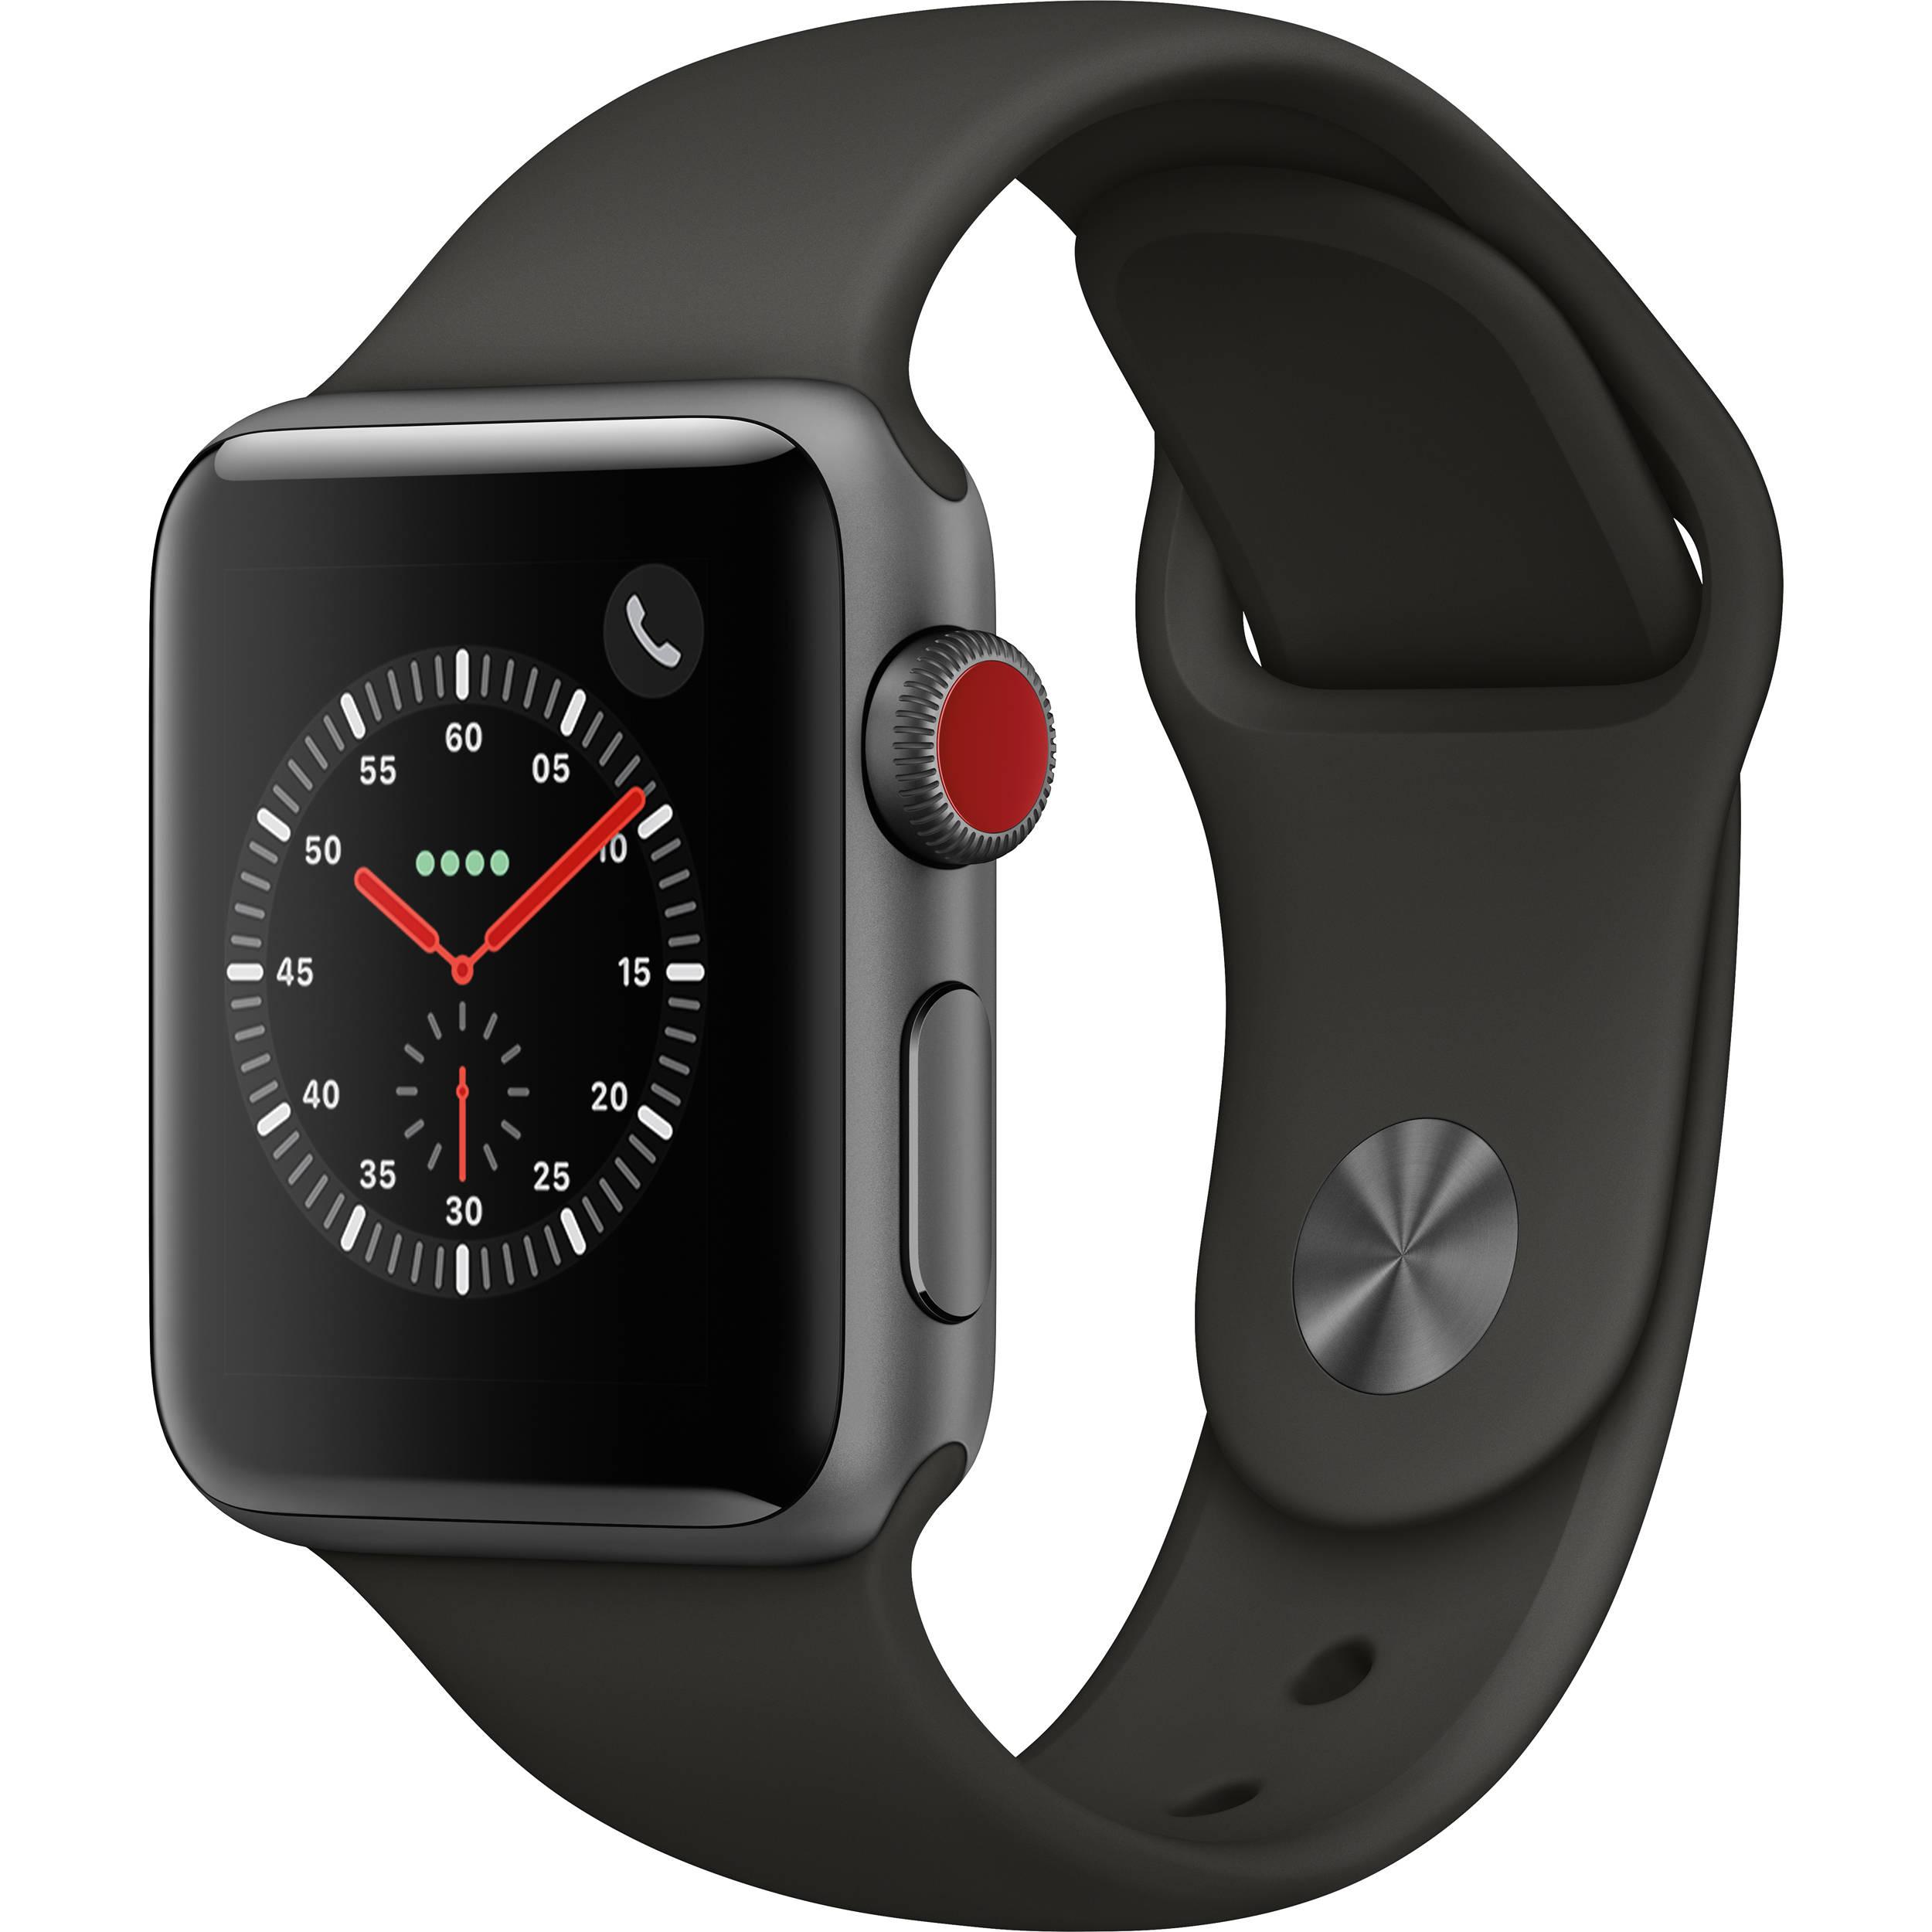 Apple Watch Series 3 38mm Smartwatch MR2W2LL/A B&H Photo Video